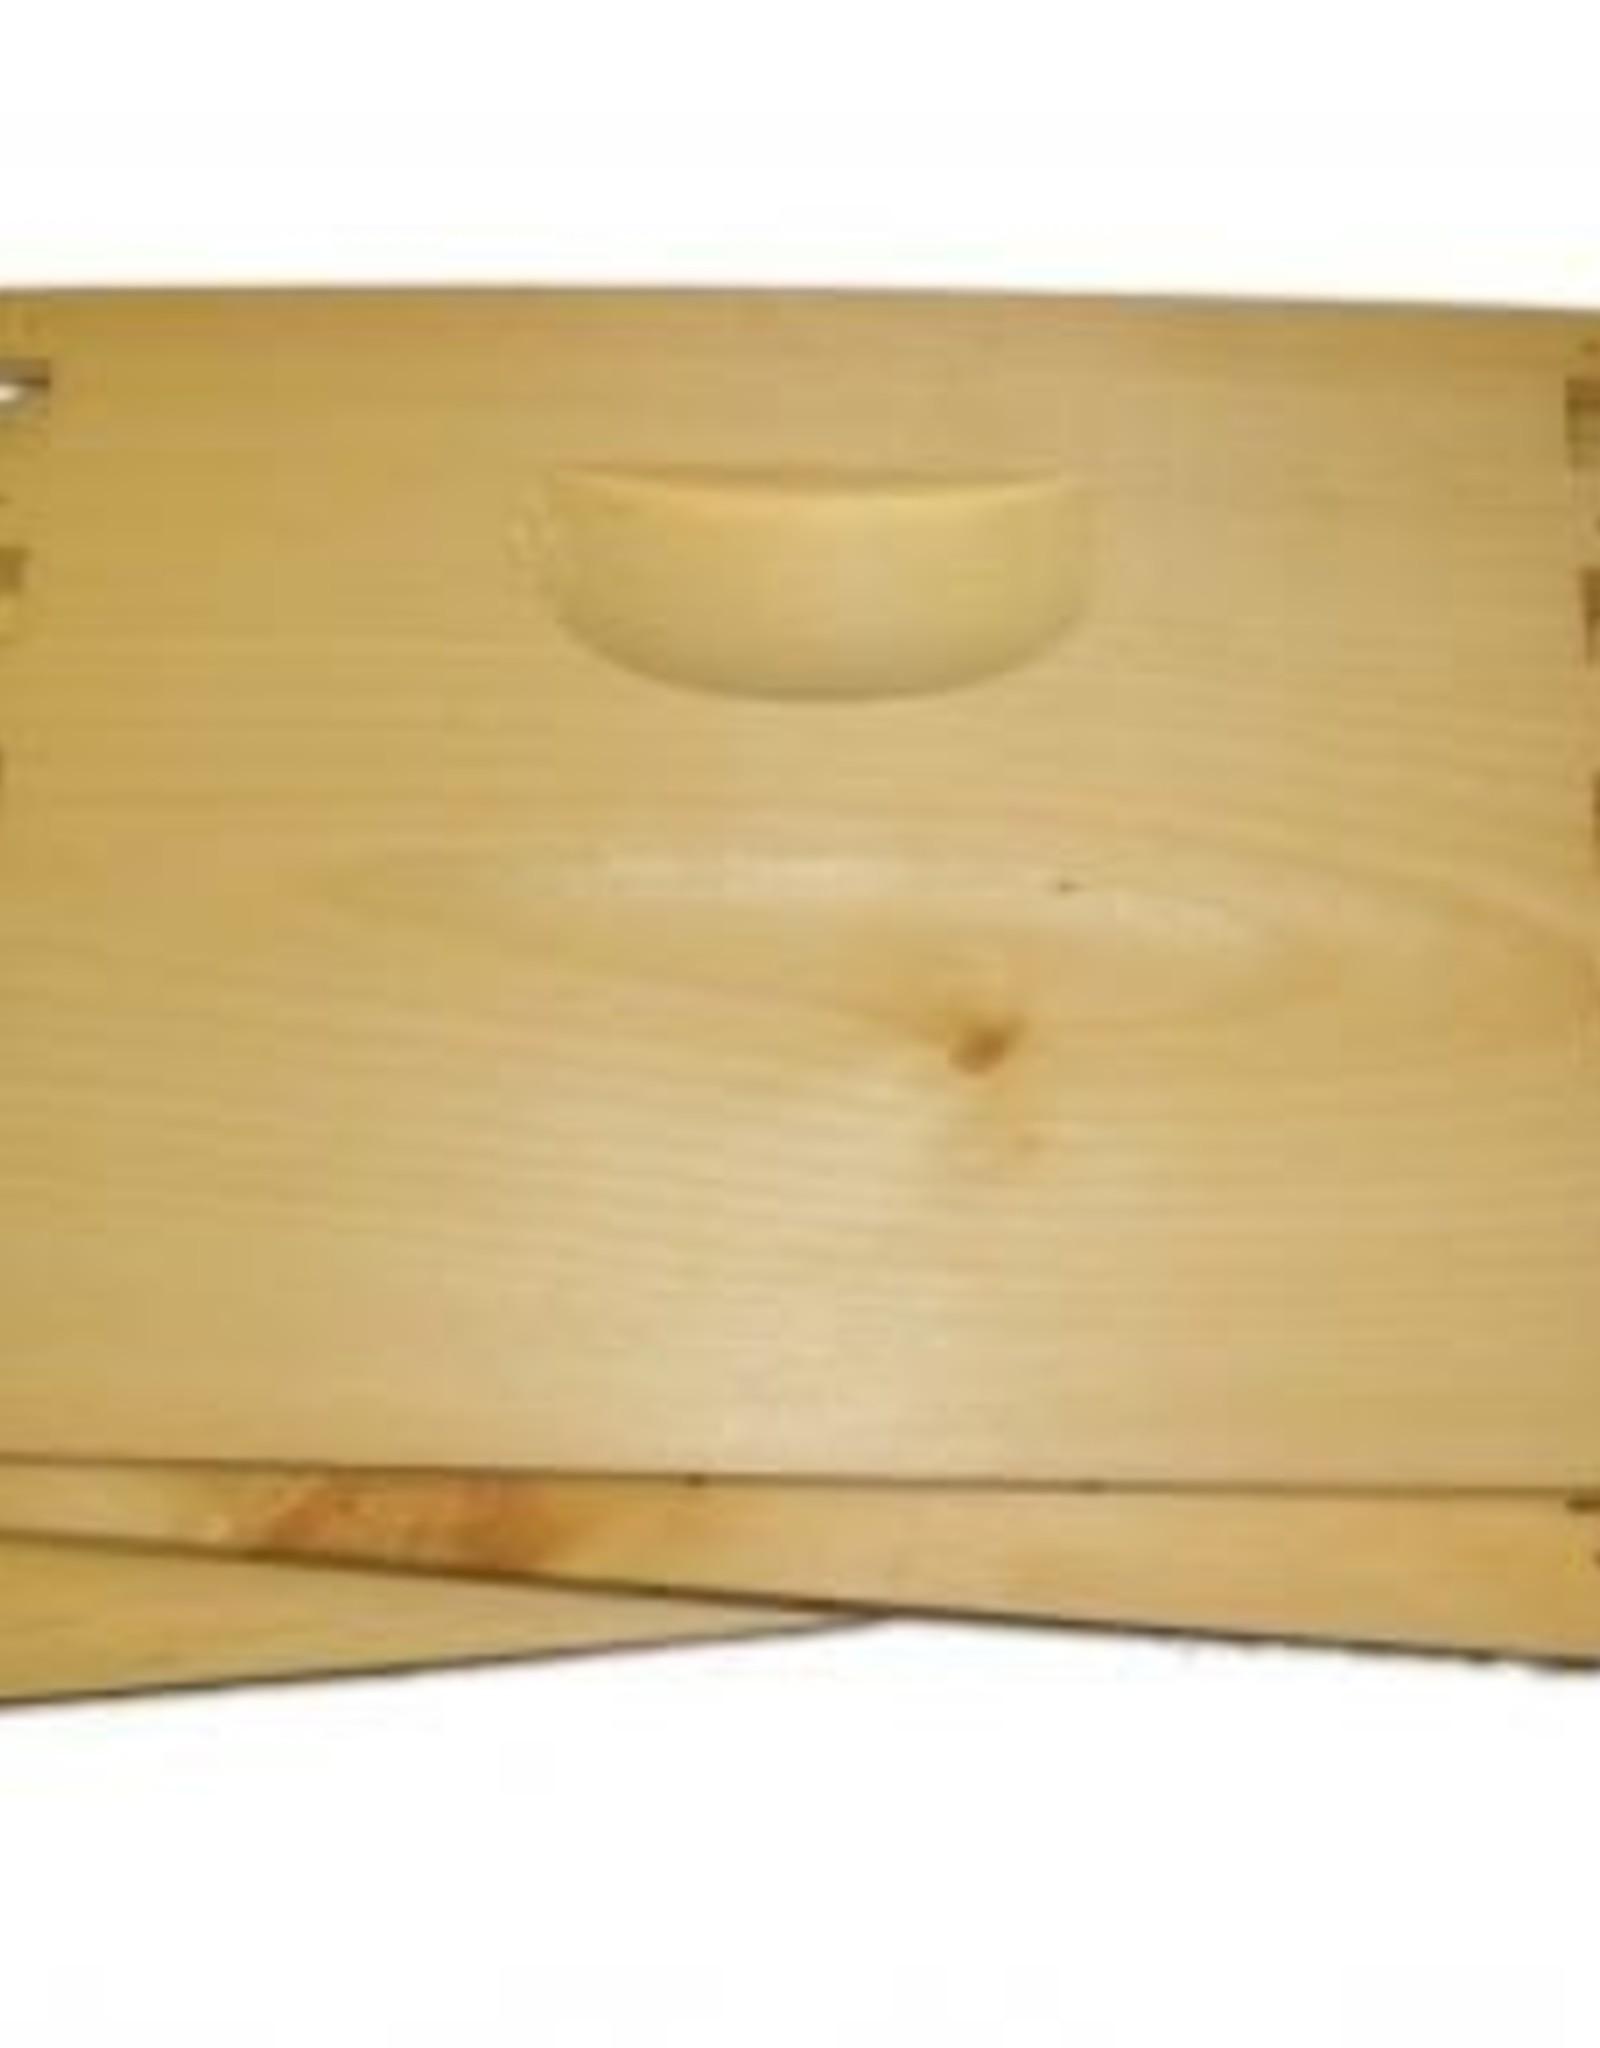 8-Frame Deep Hive Body, Unassembled